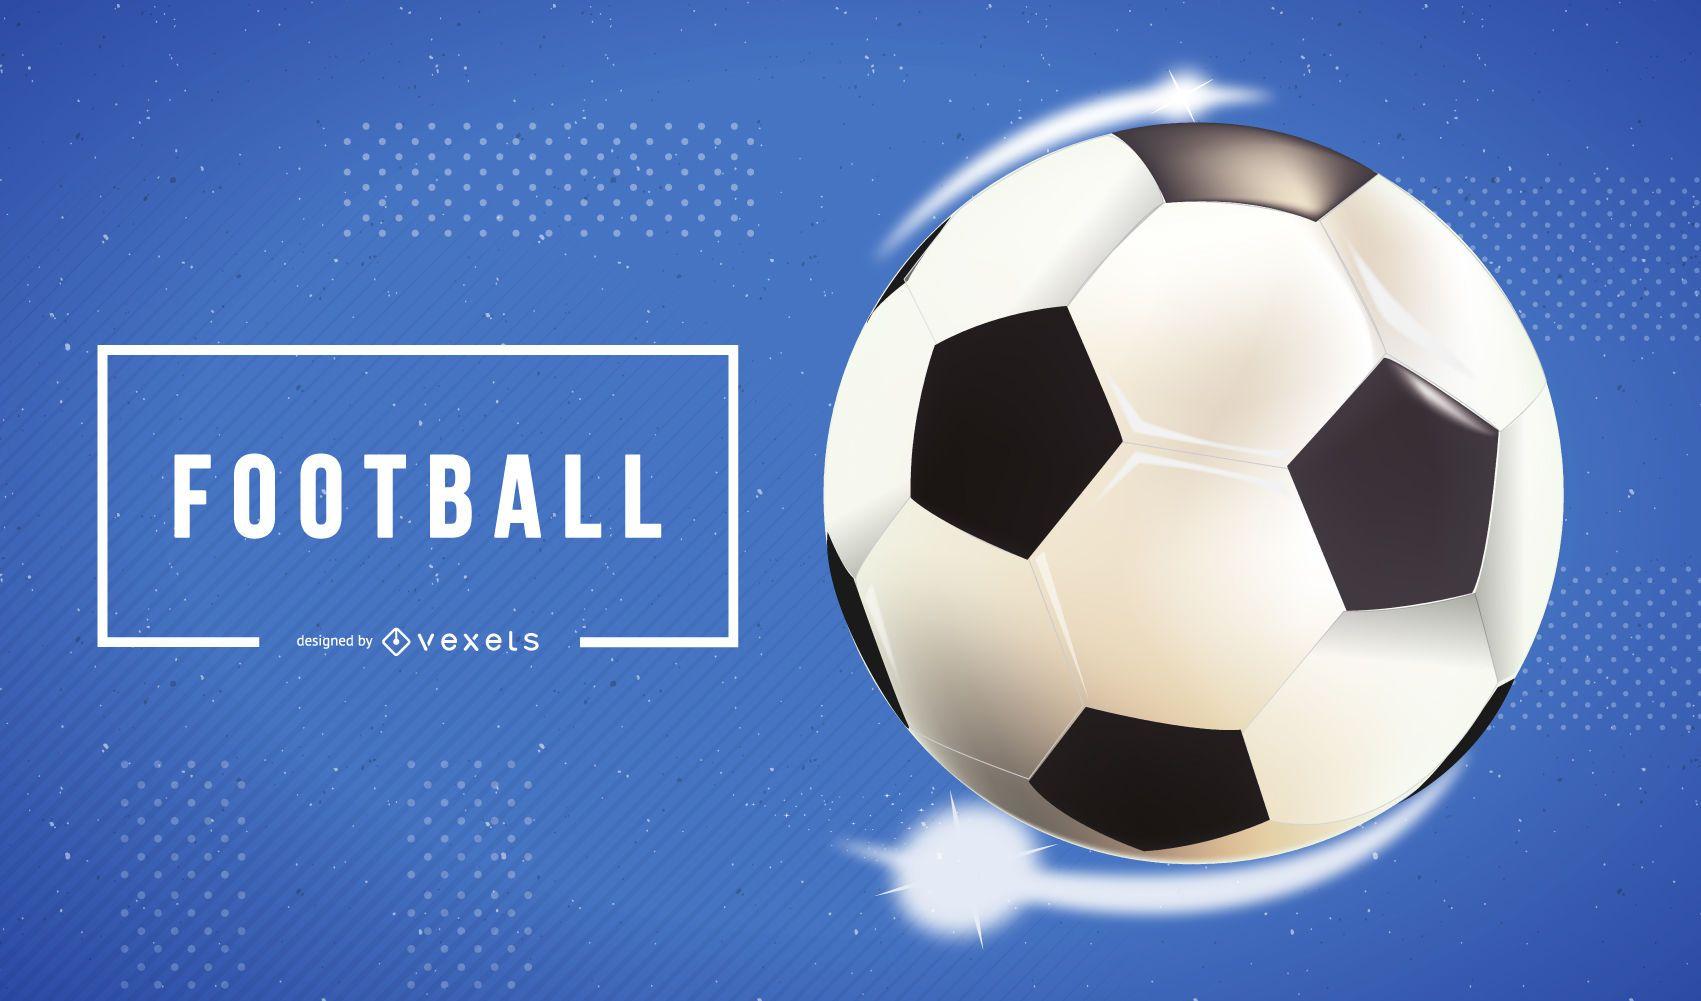 Bola de futebol de vetor realista